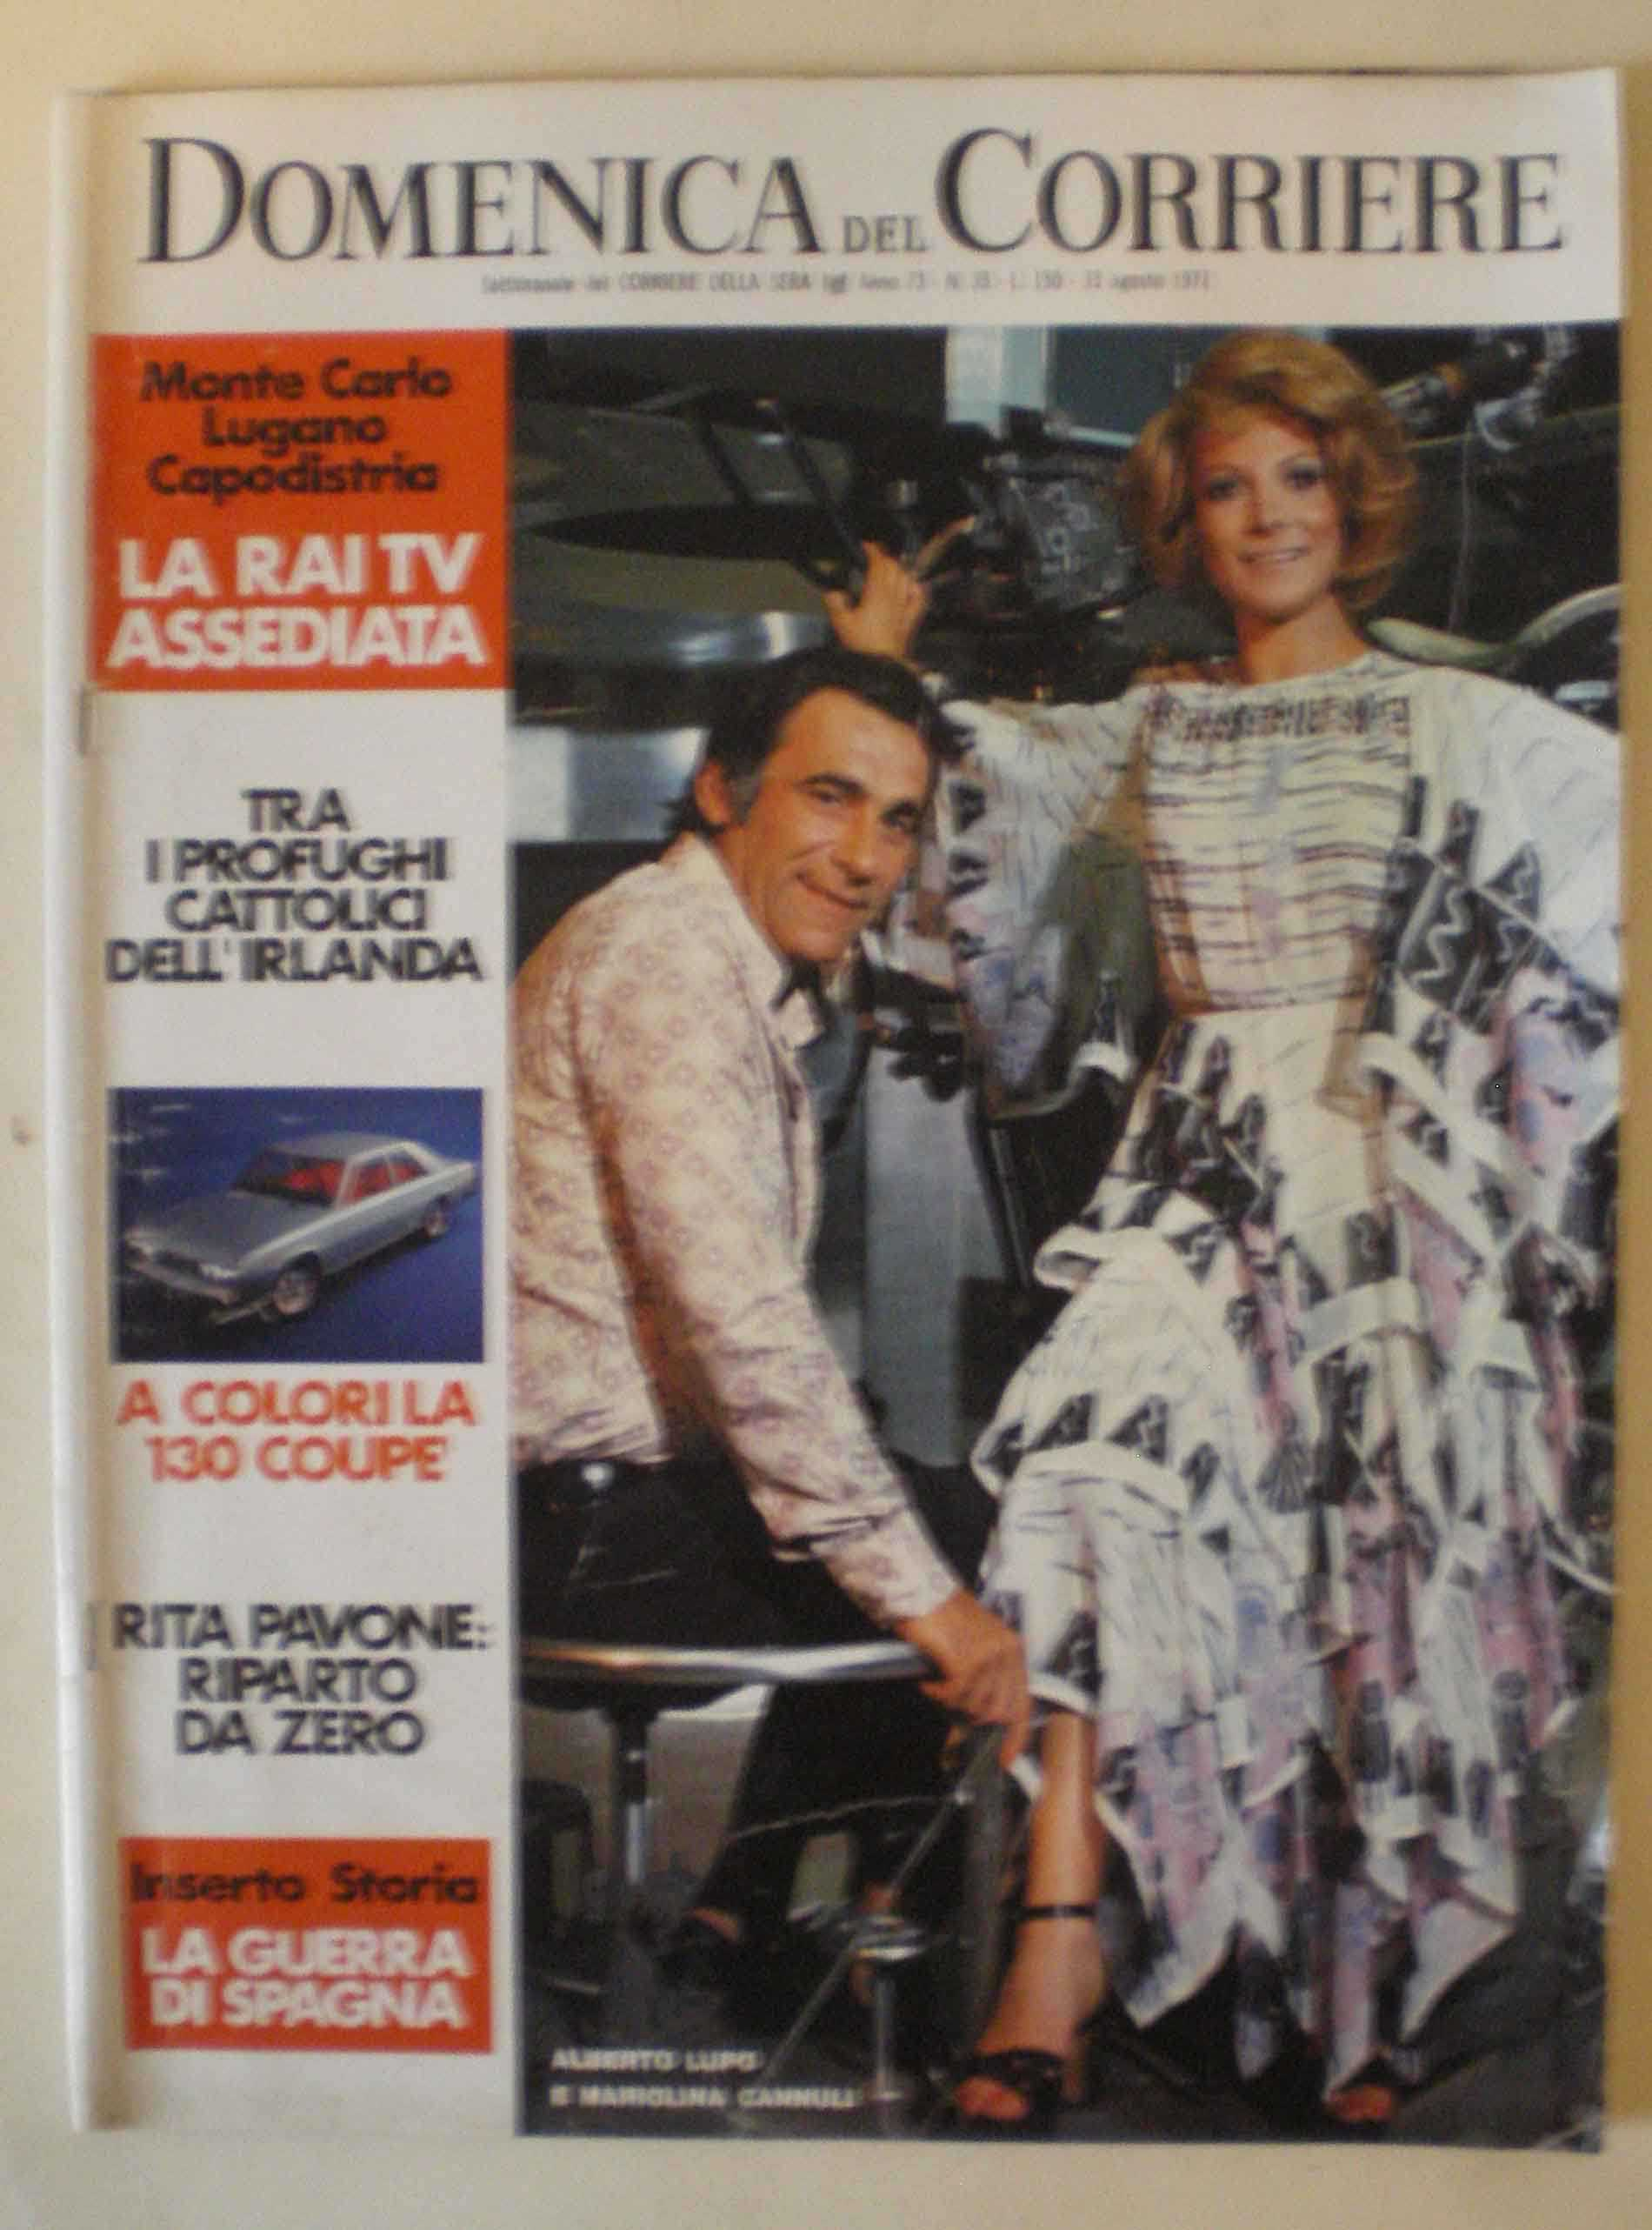 13 agosto 1971 Domenica del Corriere e suas capas espetaculares